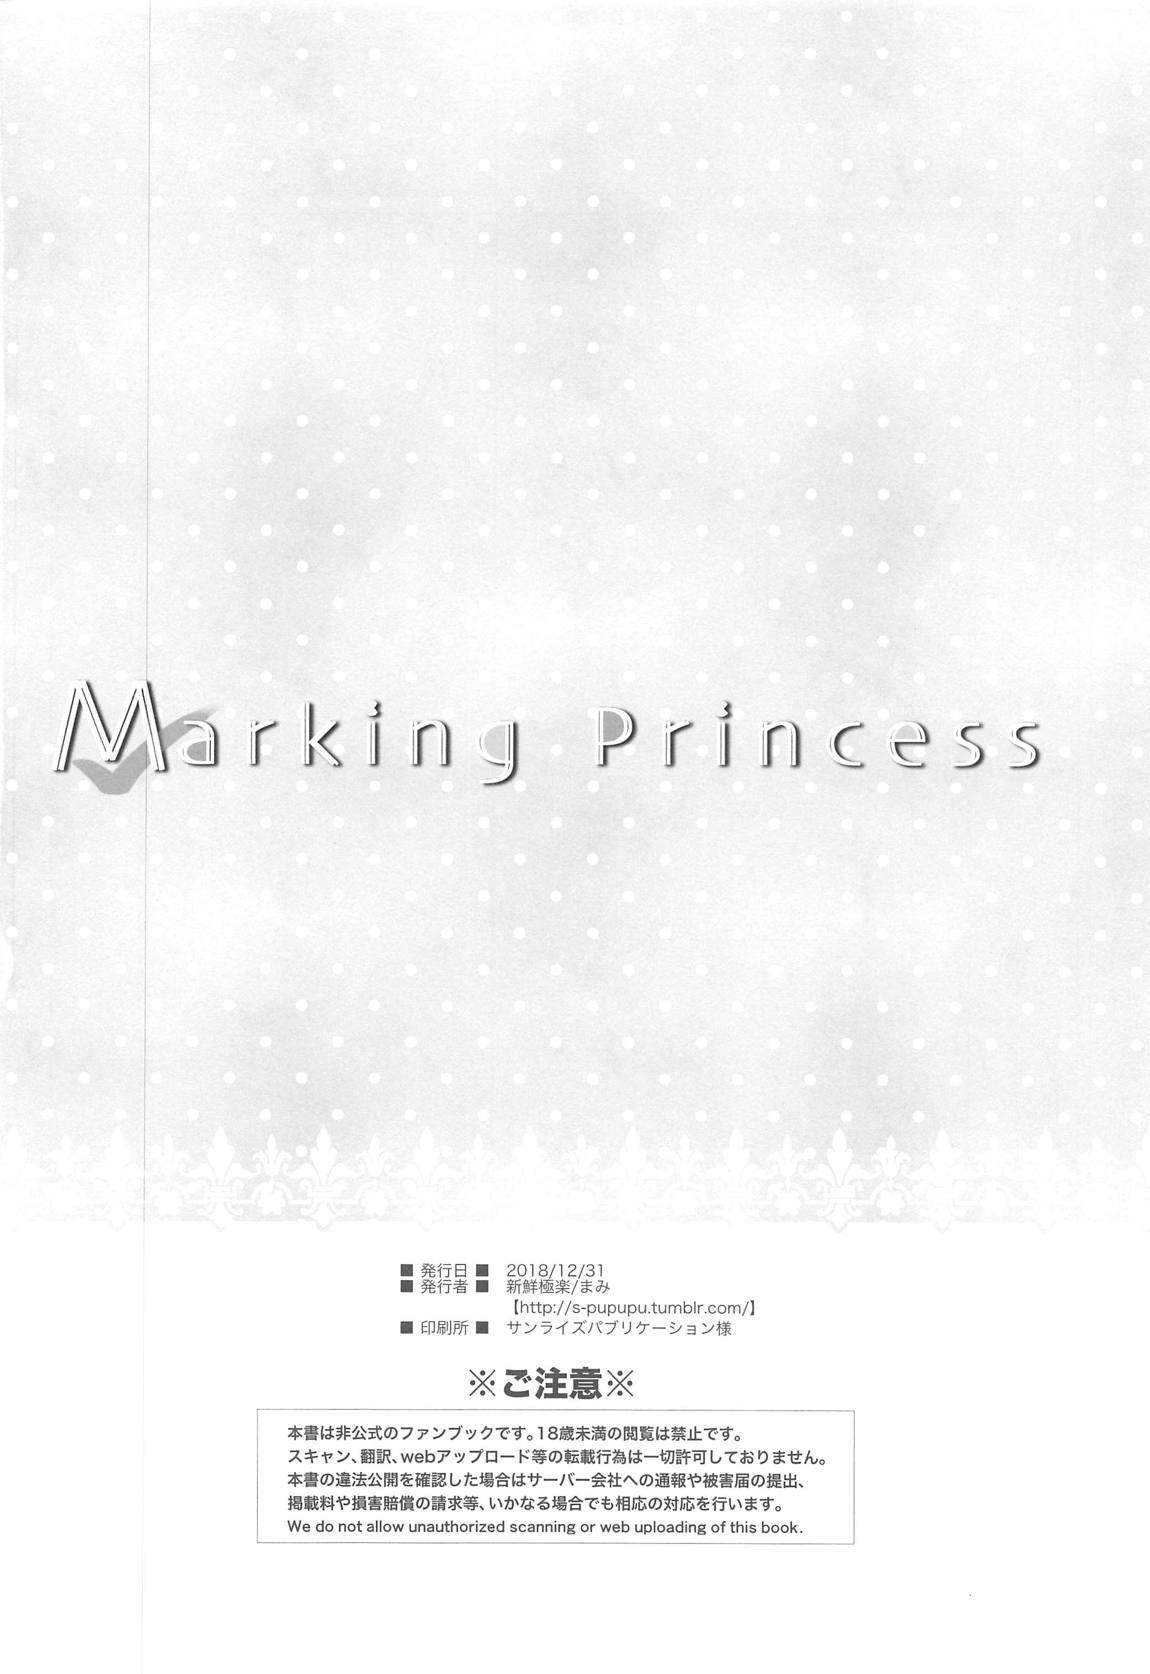 Marking Princess 24